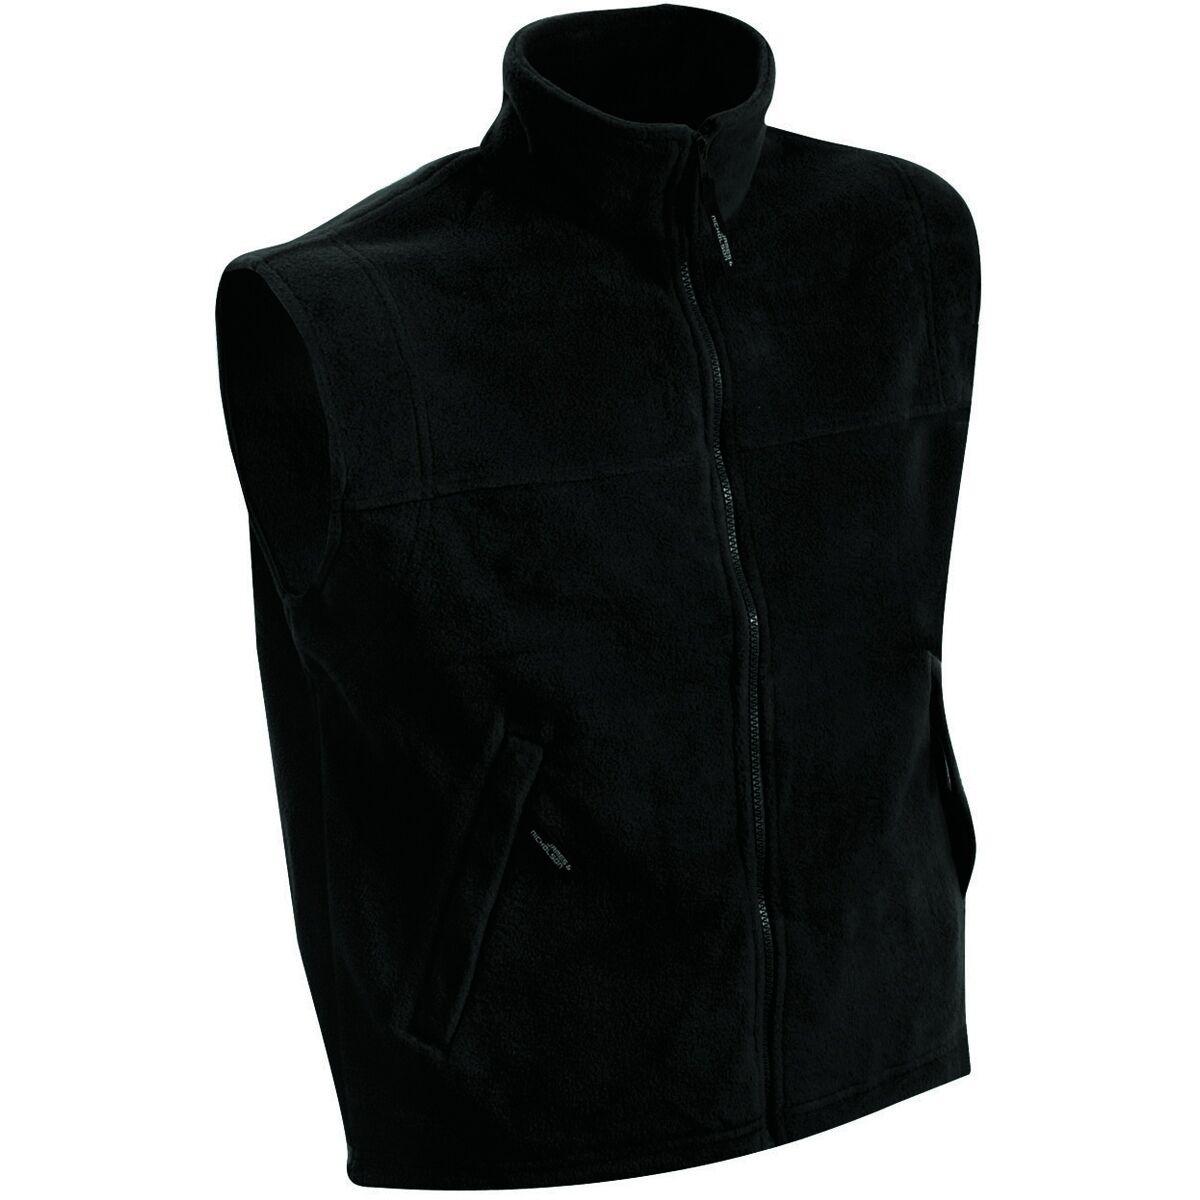 Gilet sans manches bodywarmer polaire homme - JN045 - noir